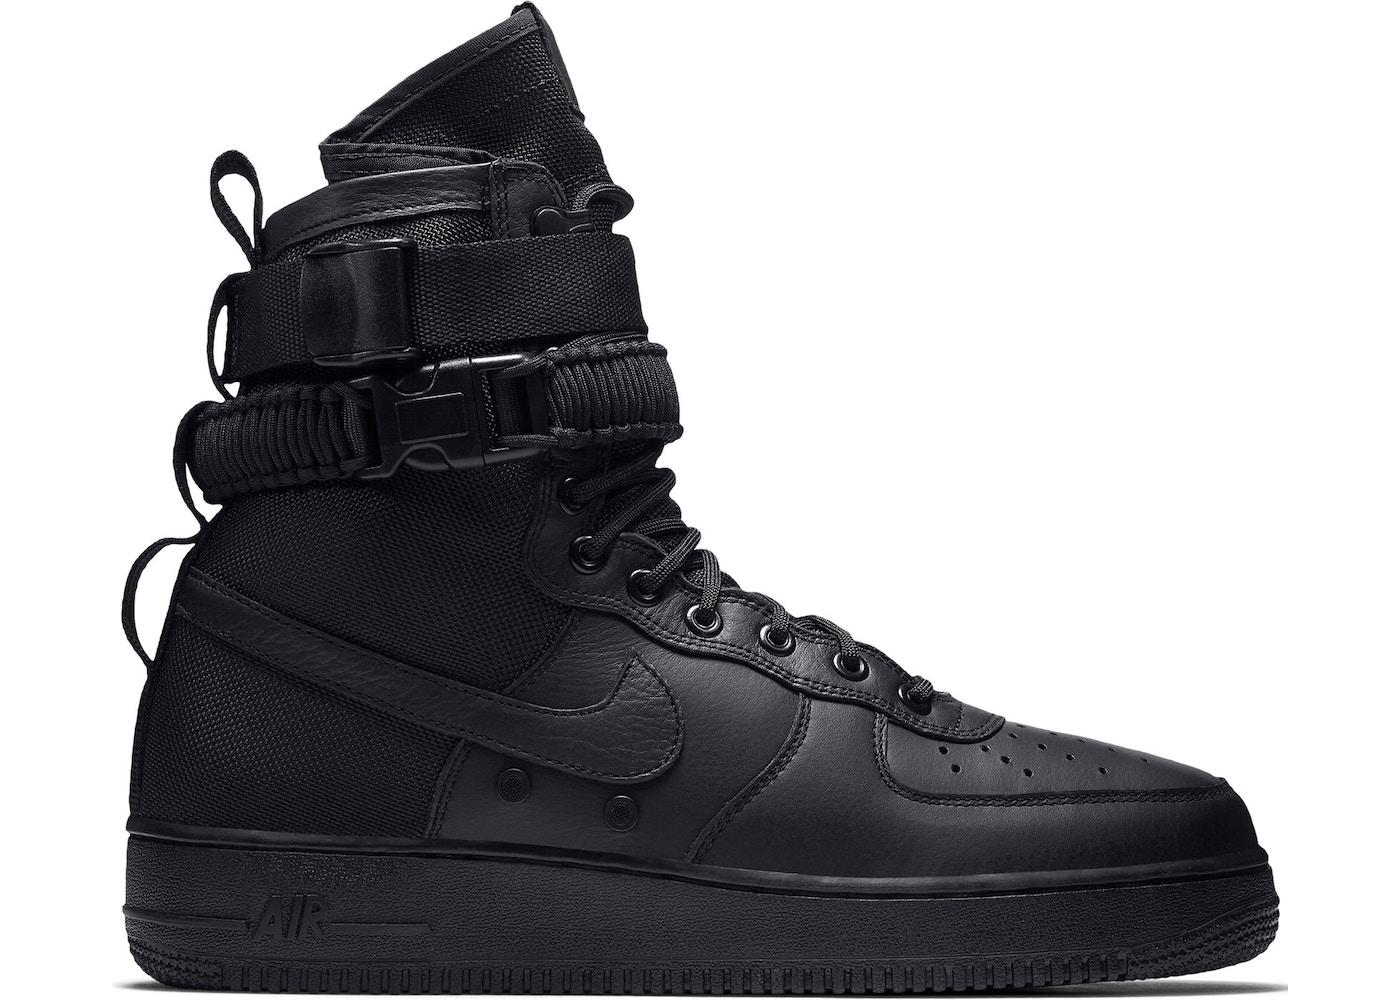 on sale 58c8e 6f869 nike air force 1 all black high